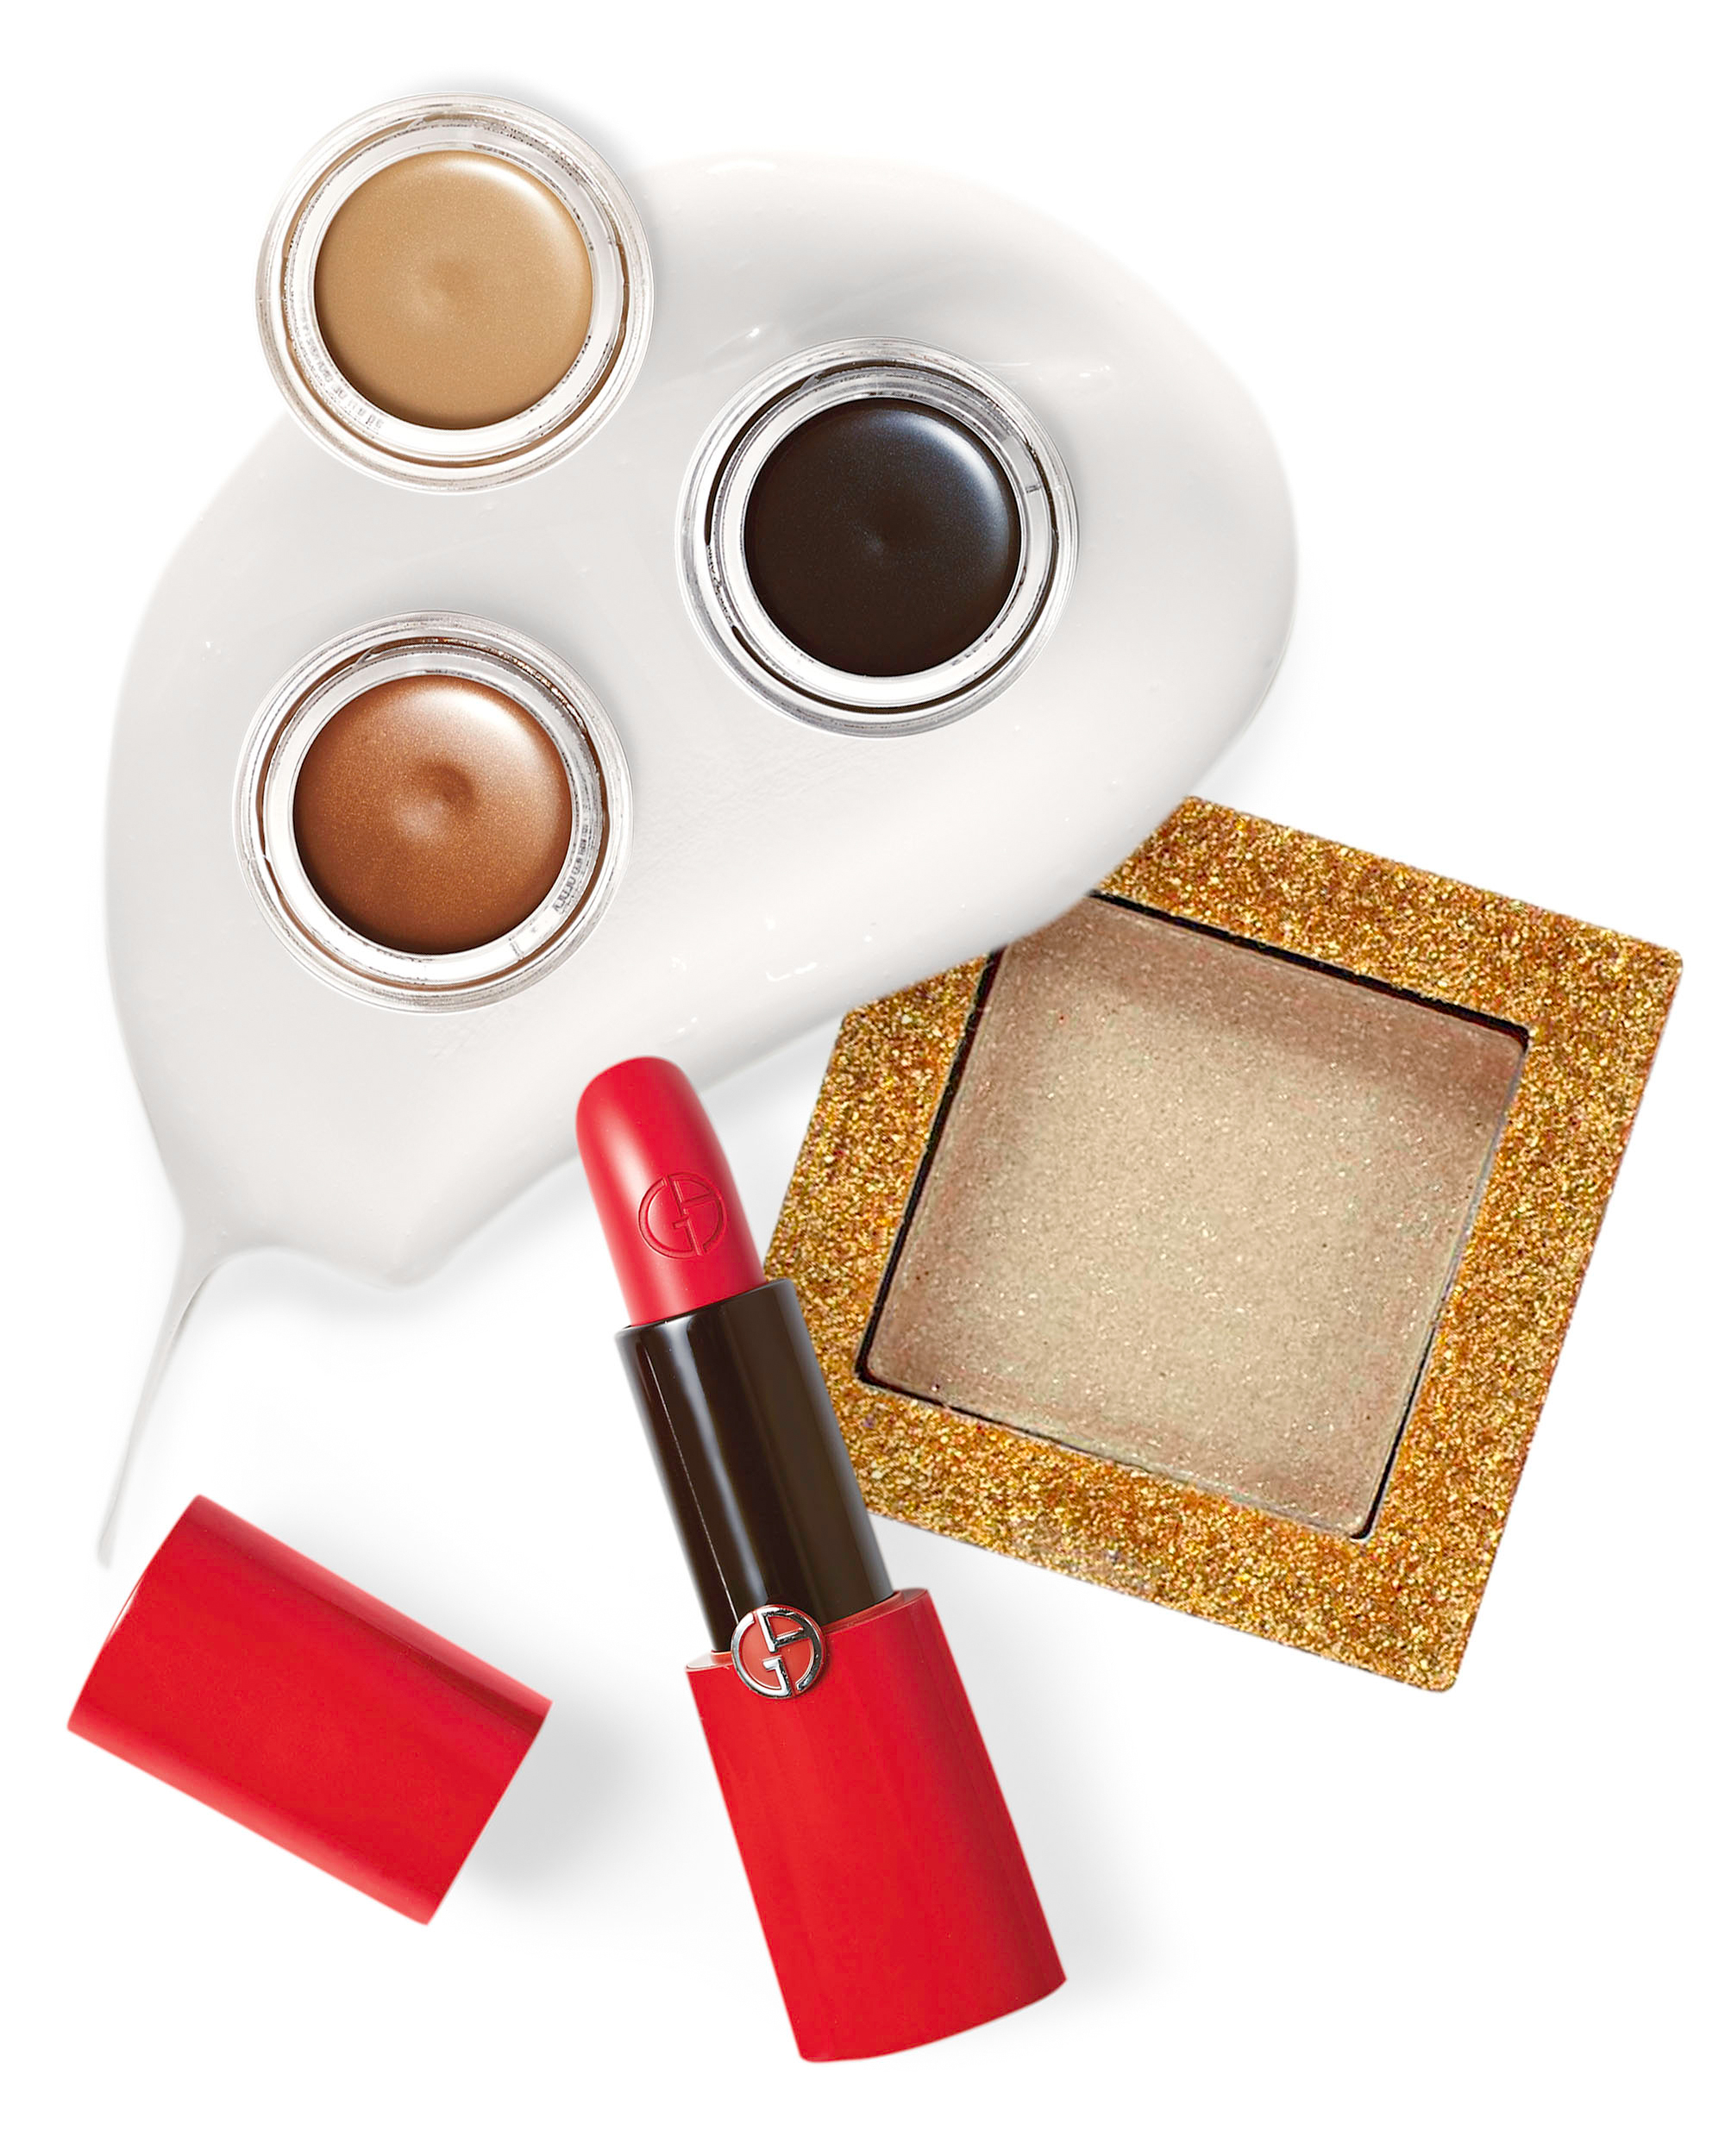 aisle-icon-beauty-products-gwen-stefani-0115.jpg